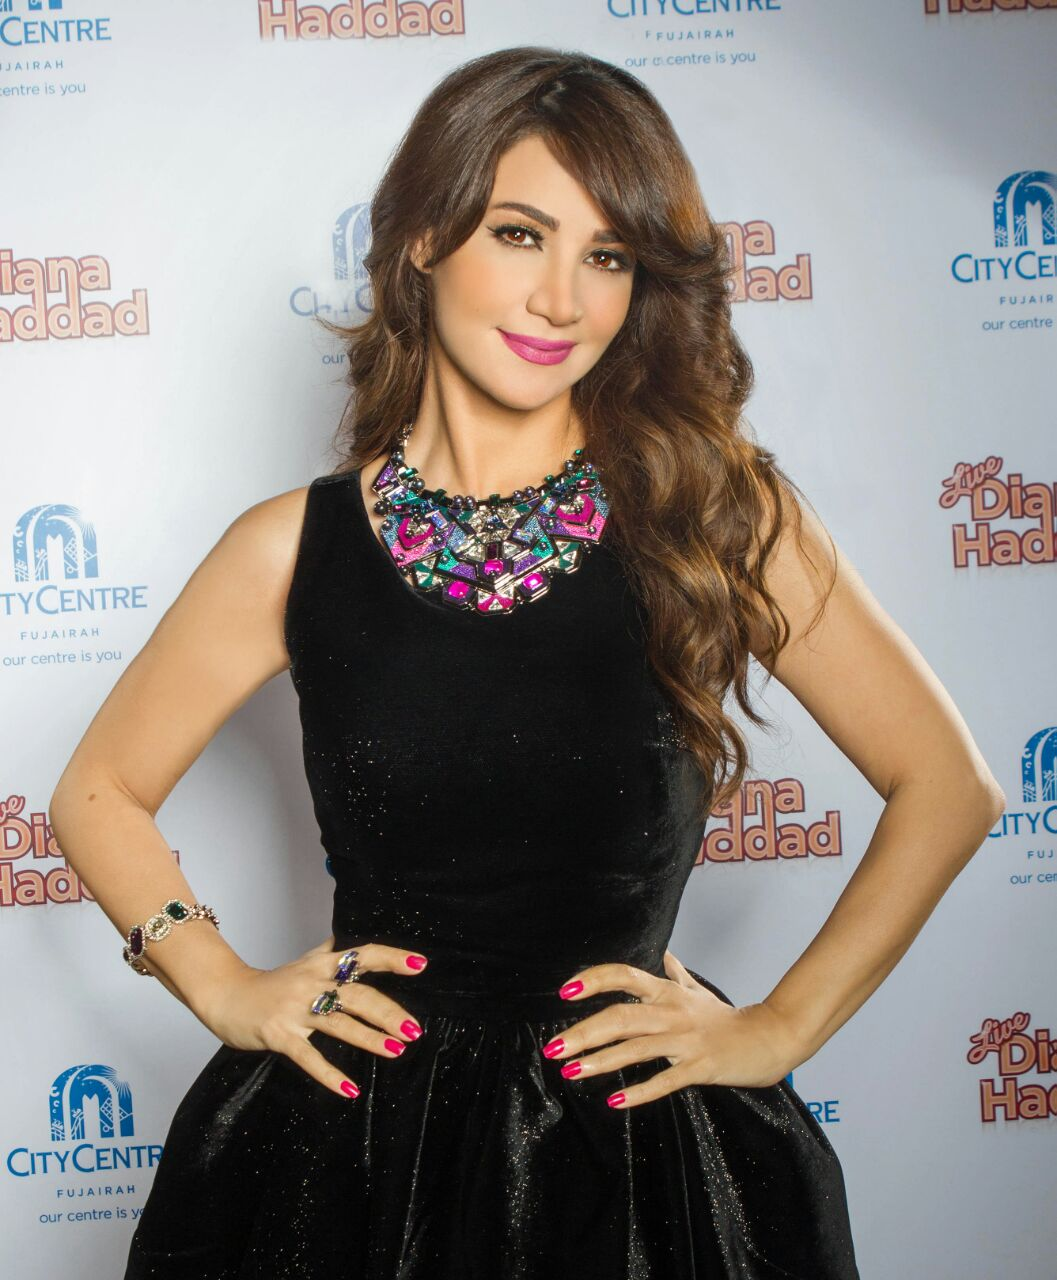 diana haddad_celebrity styling.JPG